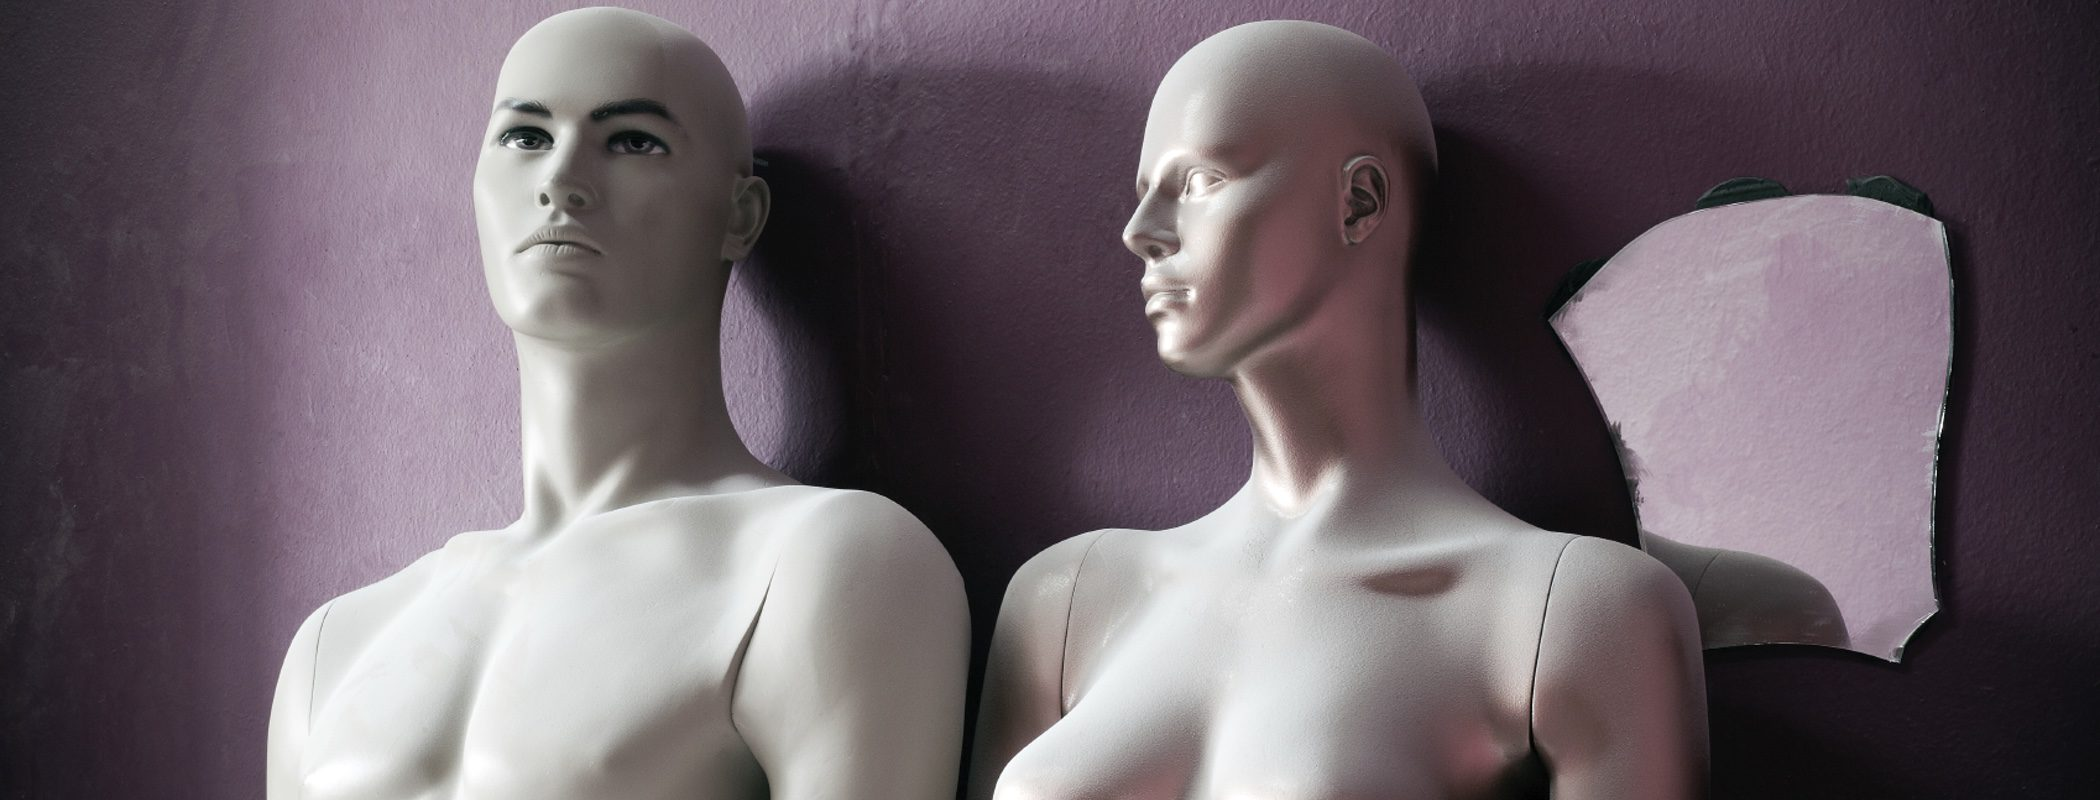 Agalmatofilia o el encontrar placer en maniquíes o estatuas